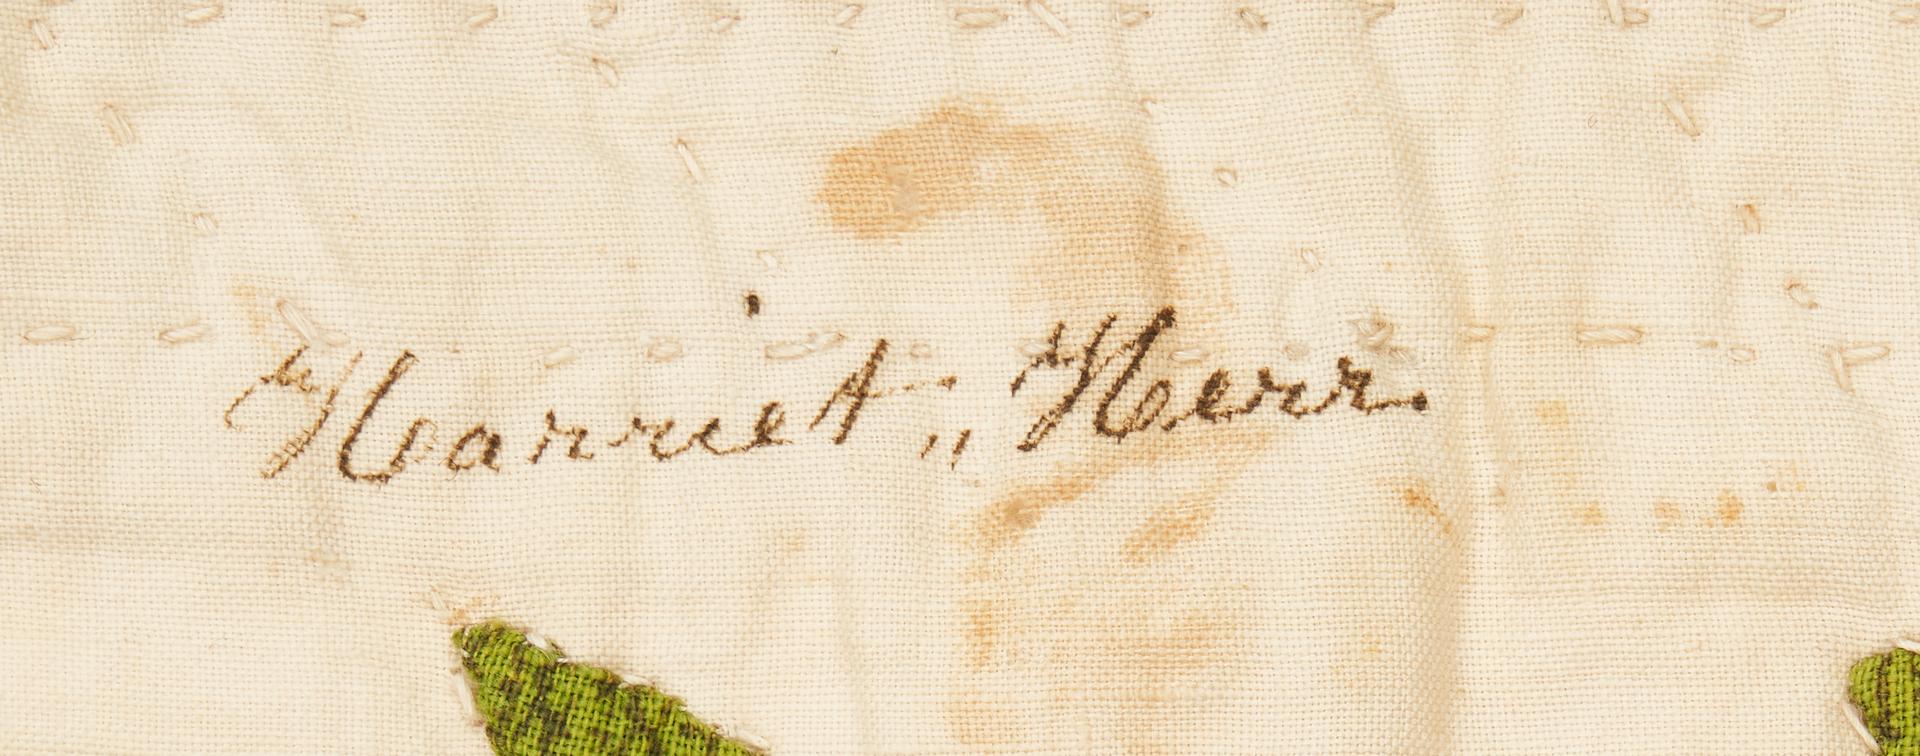 Lot 472: Pair of Tulip Quilts, Signed, attr. Pennsylvania